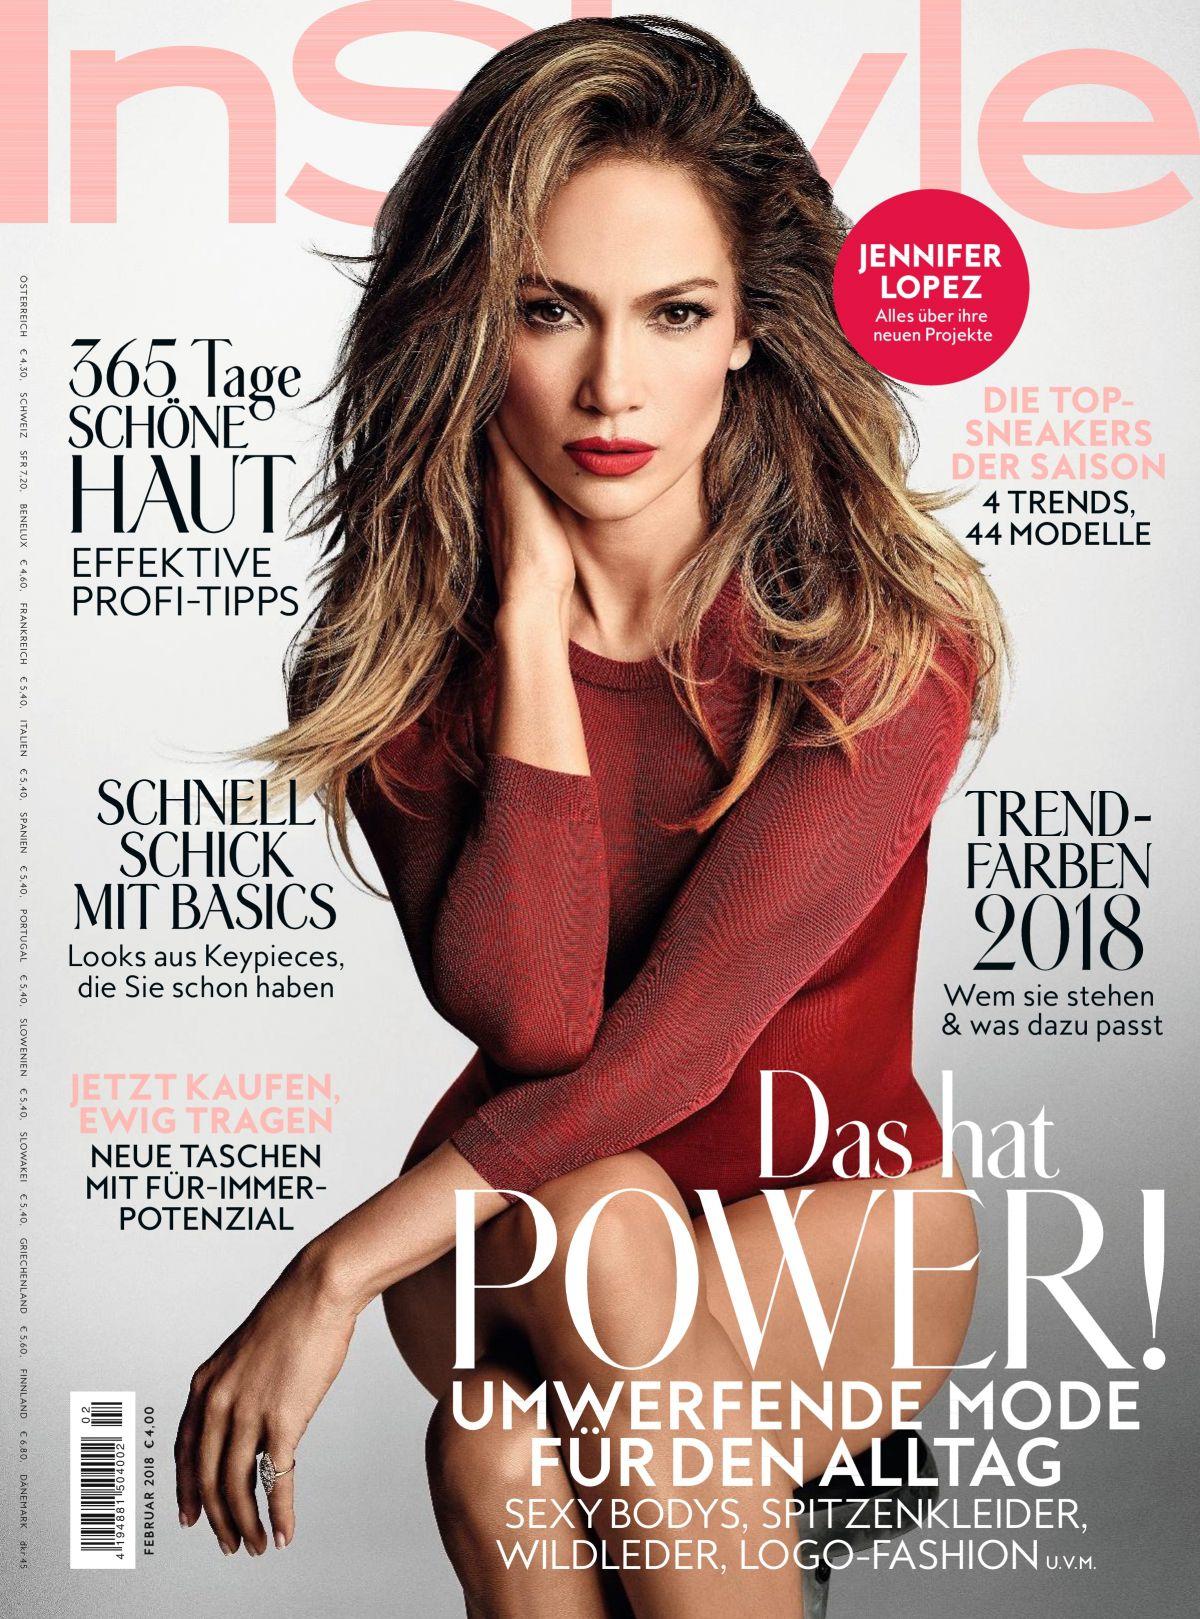 JENNIFER LOPEZ In Instyle Magazine, Germany Februar 2018